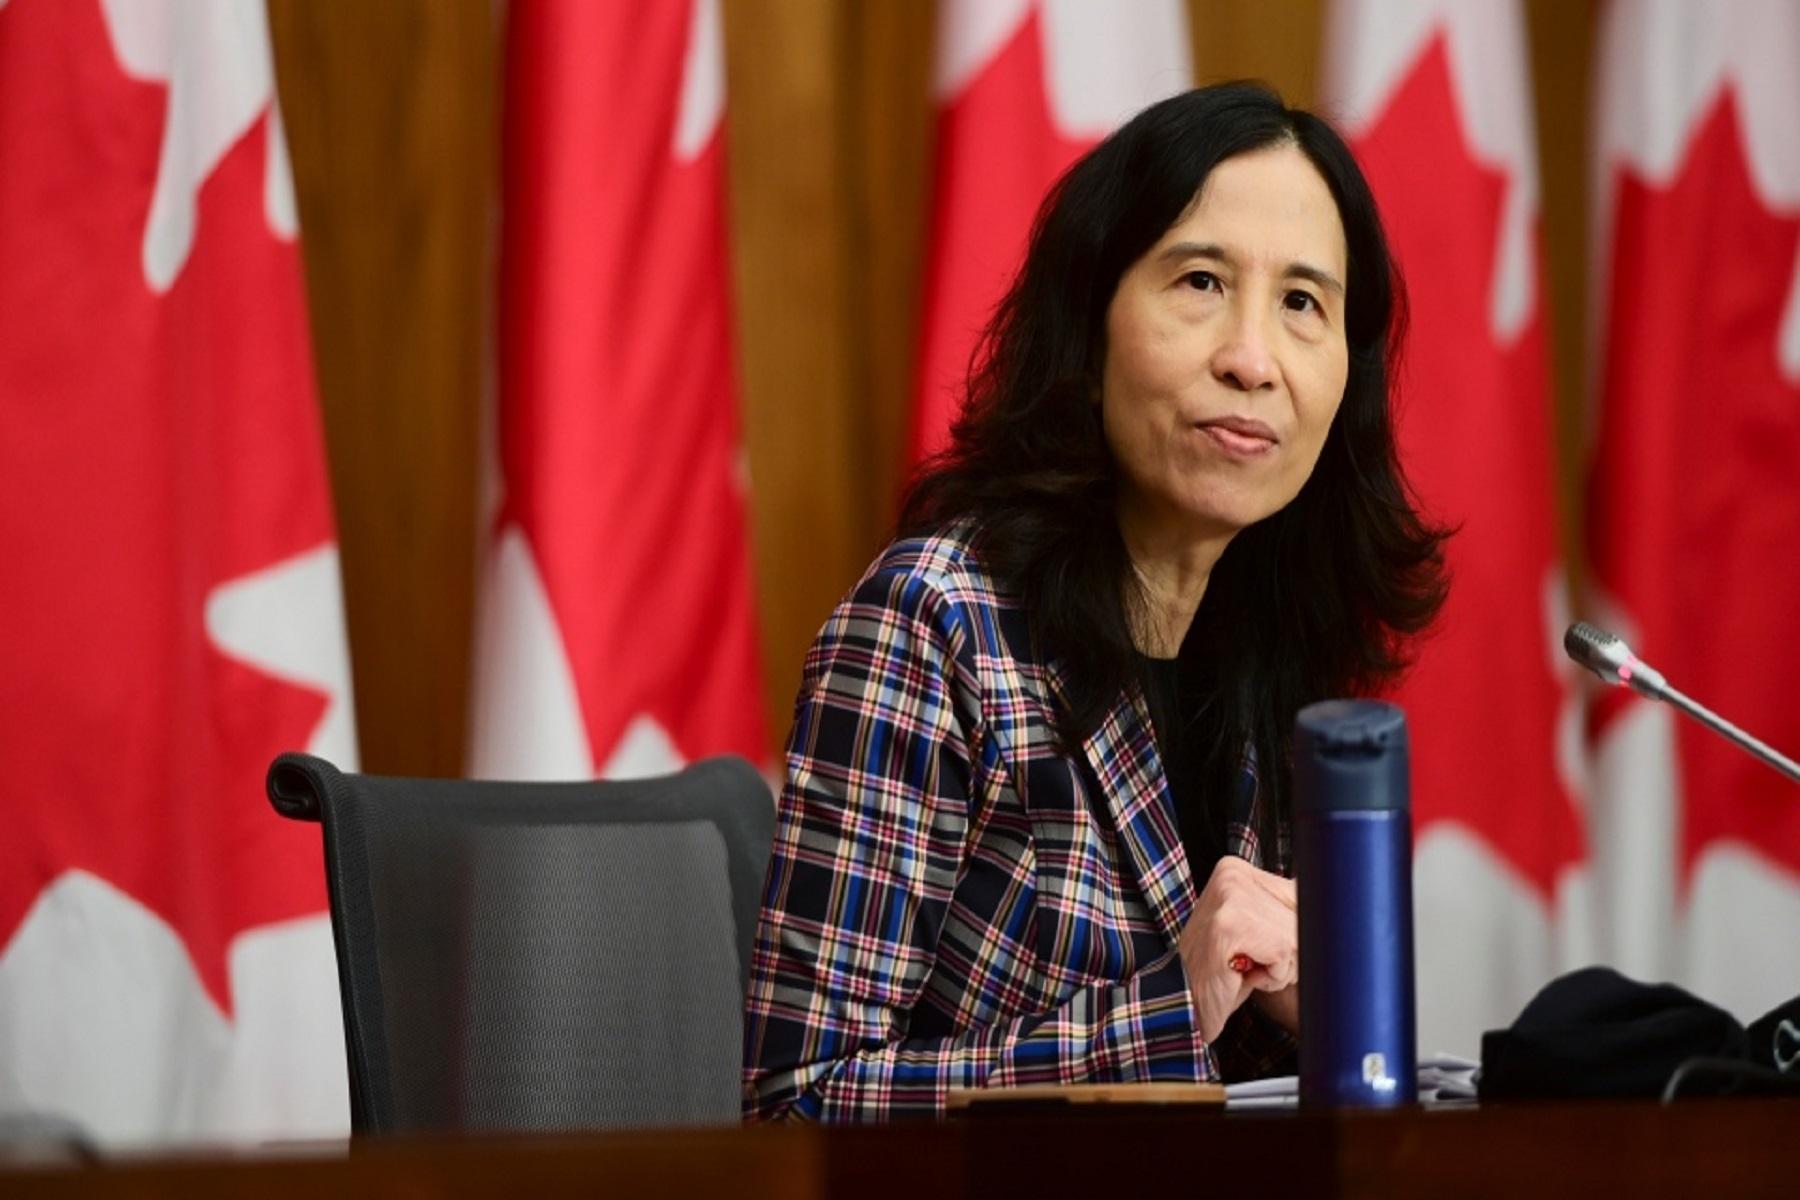 Trudeau Καναδάς: Η covid -19 διακόπτει τους εορτασμούς του Πάσχα για δεύτερη χρονιά